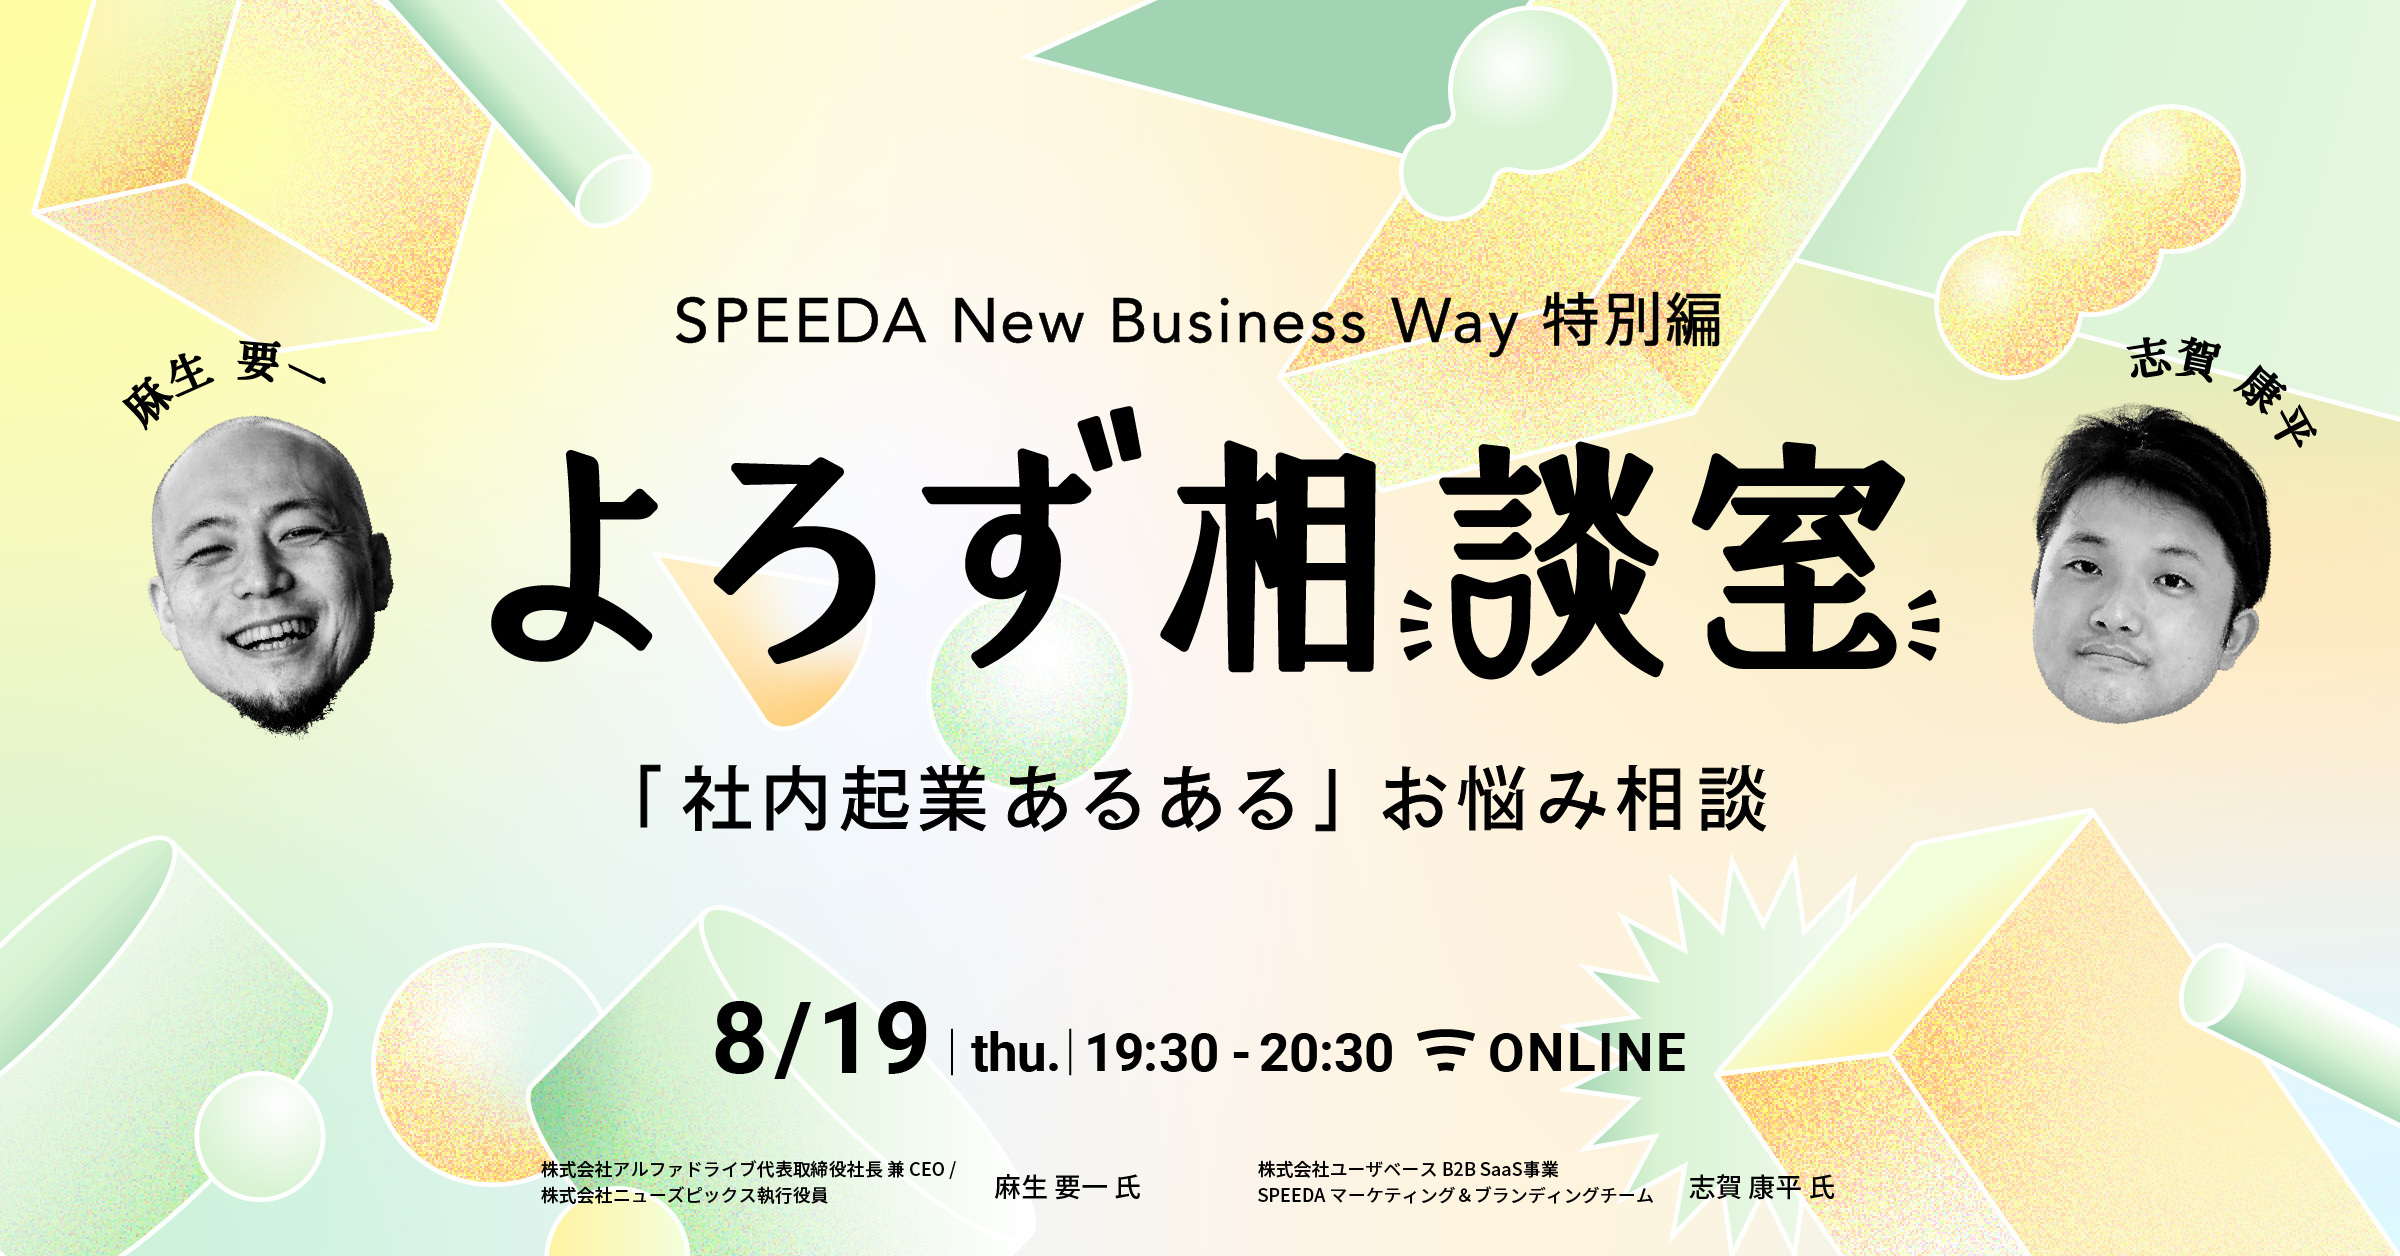 【SPEEDA New Business Way 特別編】  新規事業よろず相談室 ~「社内起業あるある」お悩み相談~